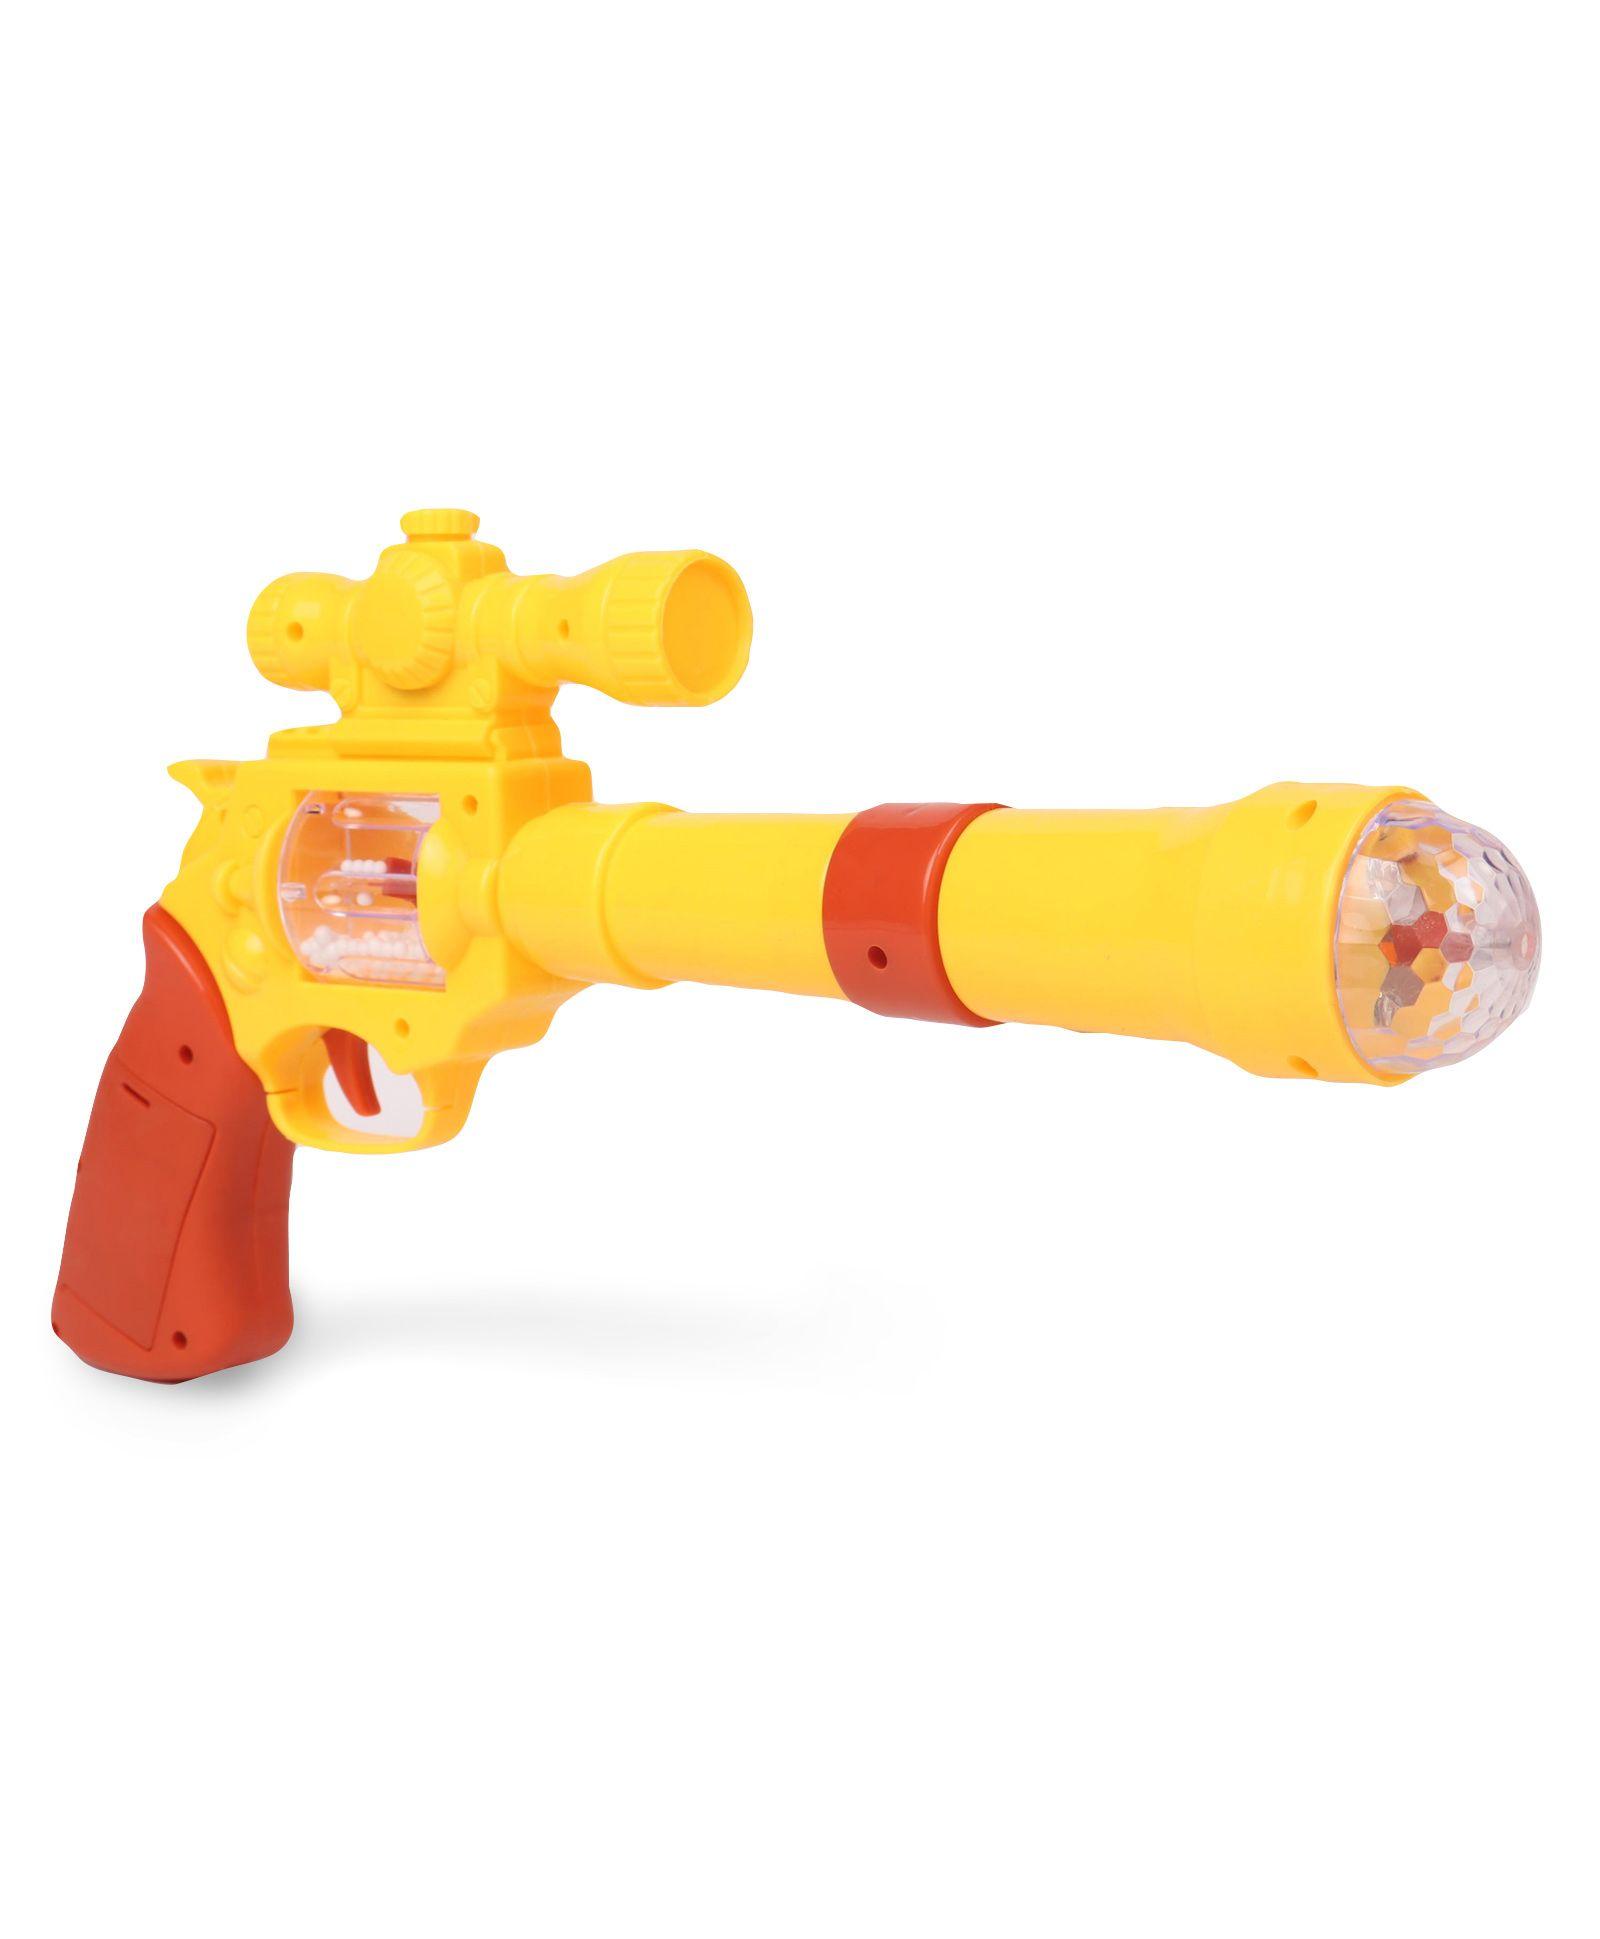 Playmate Pirate Gun With Light And Sound - Yellow Dark Orange